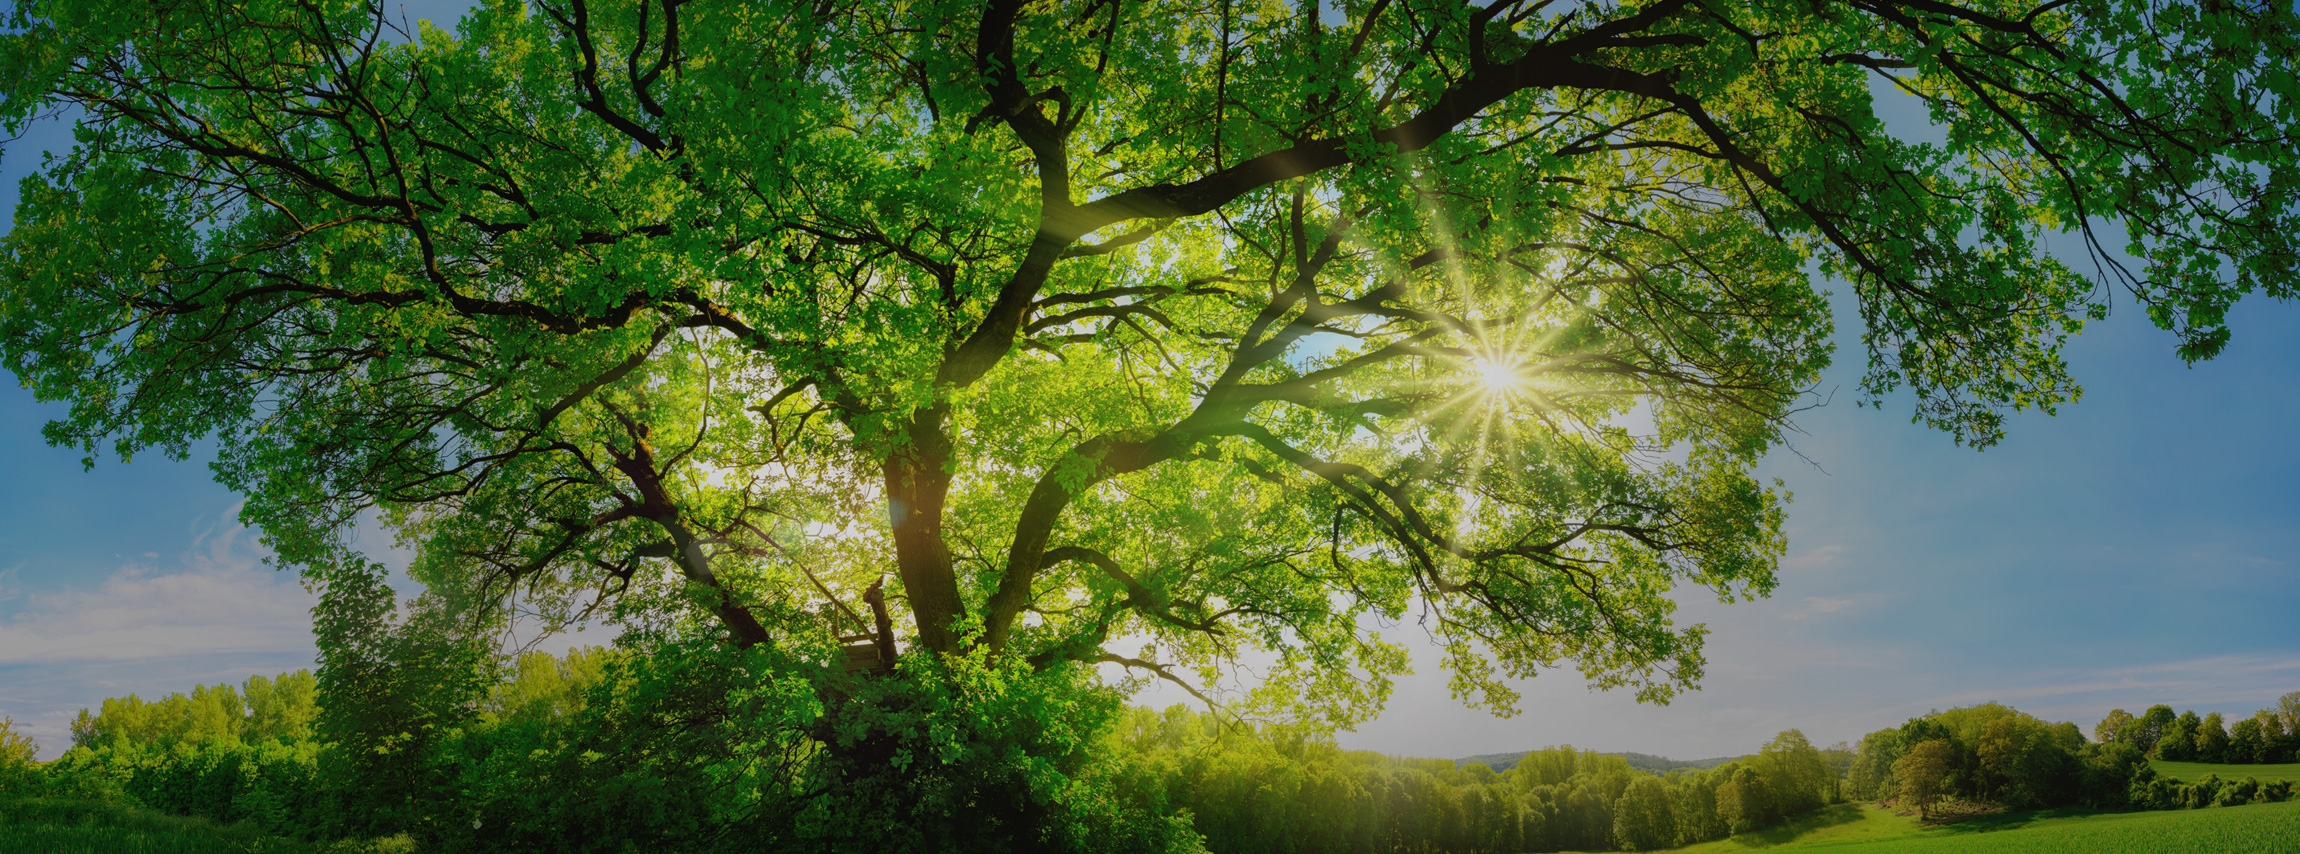 Beechwood Treesurgery Ltd (@beechwoodtree) Cover Image